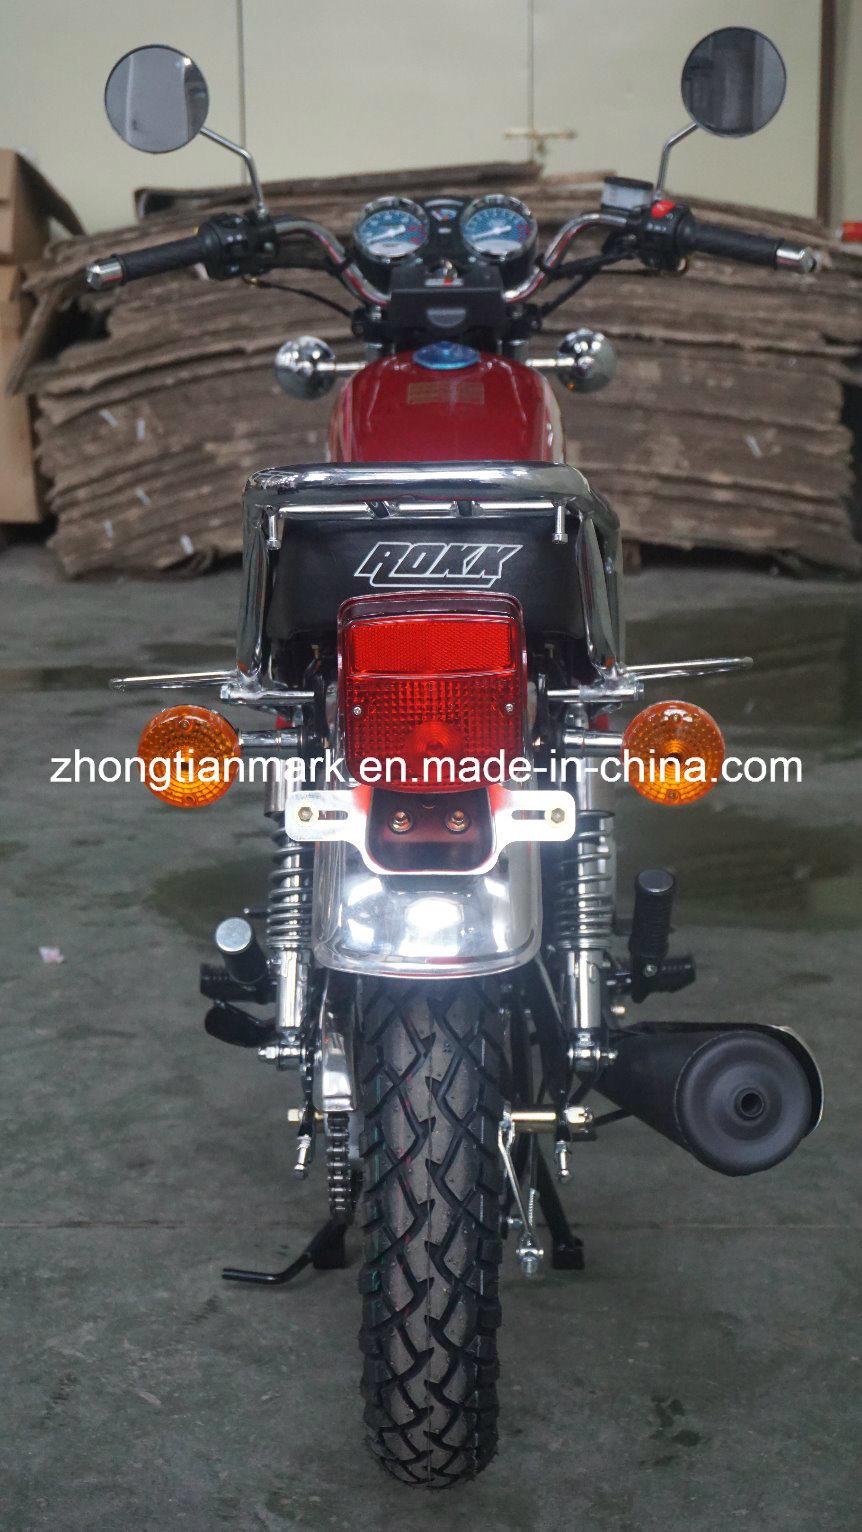 Suzuki Gn125 Customizable Type Cheapest Model